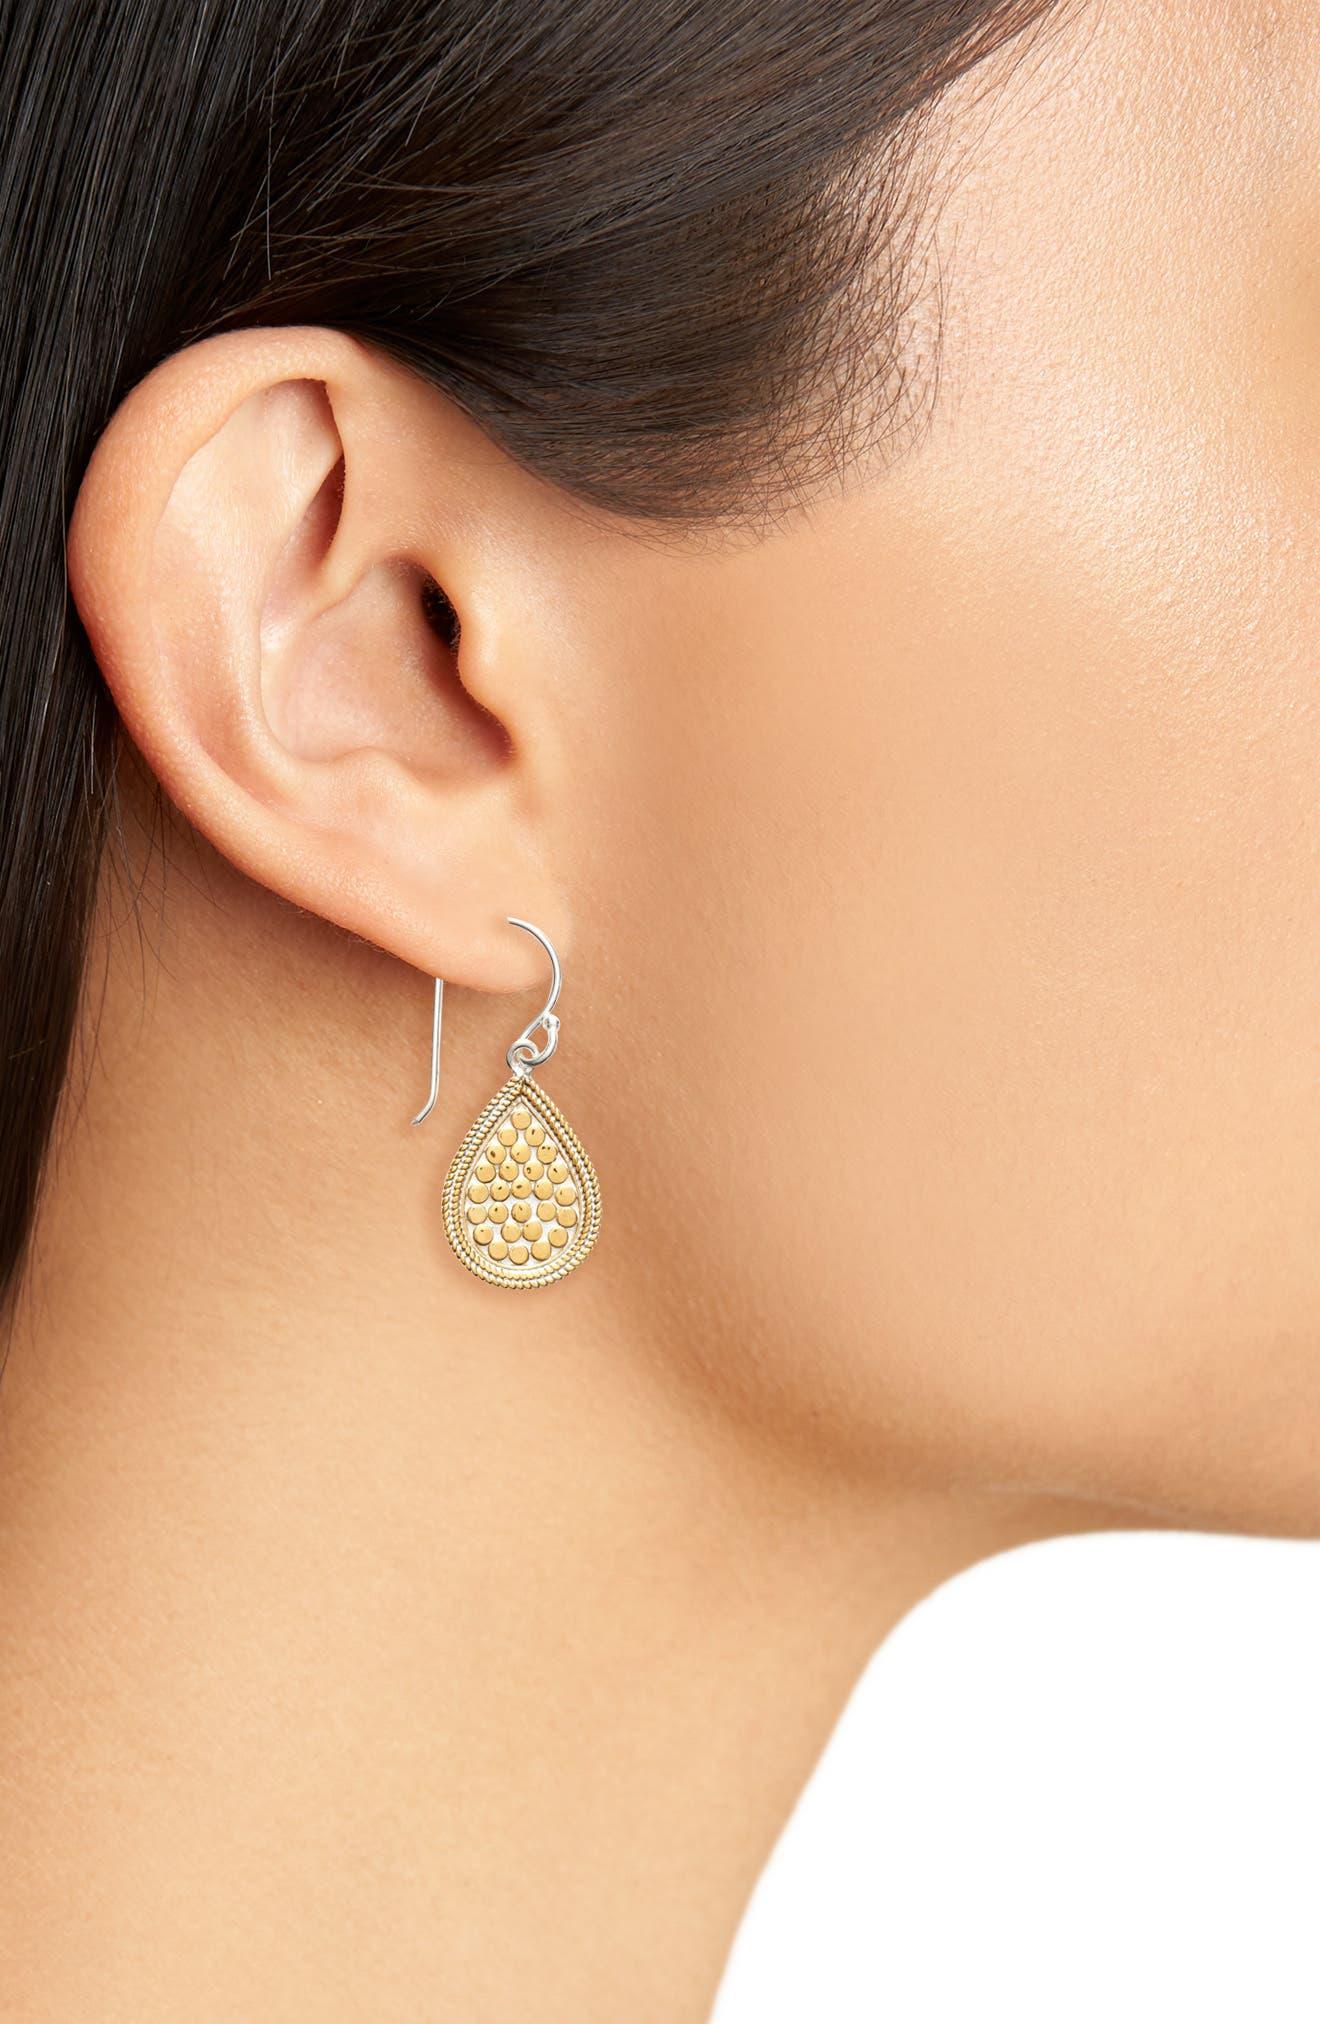 'Gili' Small Teardrop Earrings,                             Alternate thumbnail 2, color,                             GOLD/ SILVER